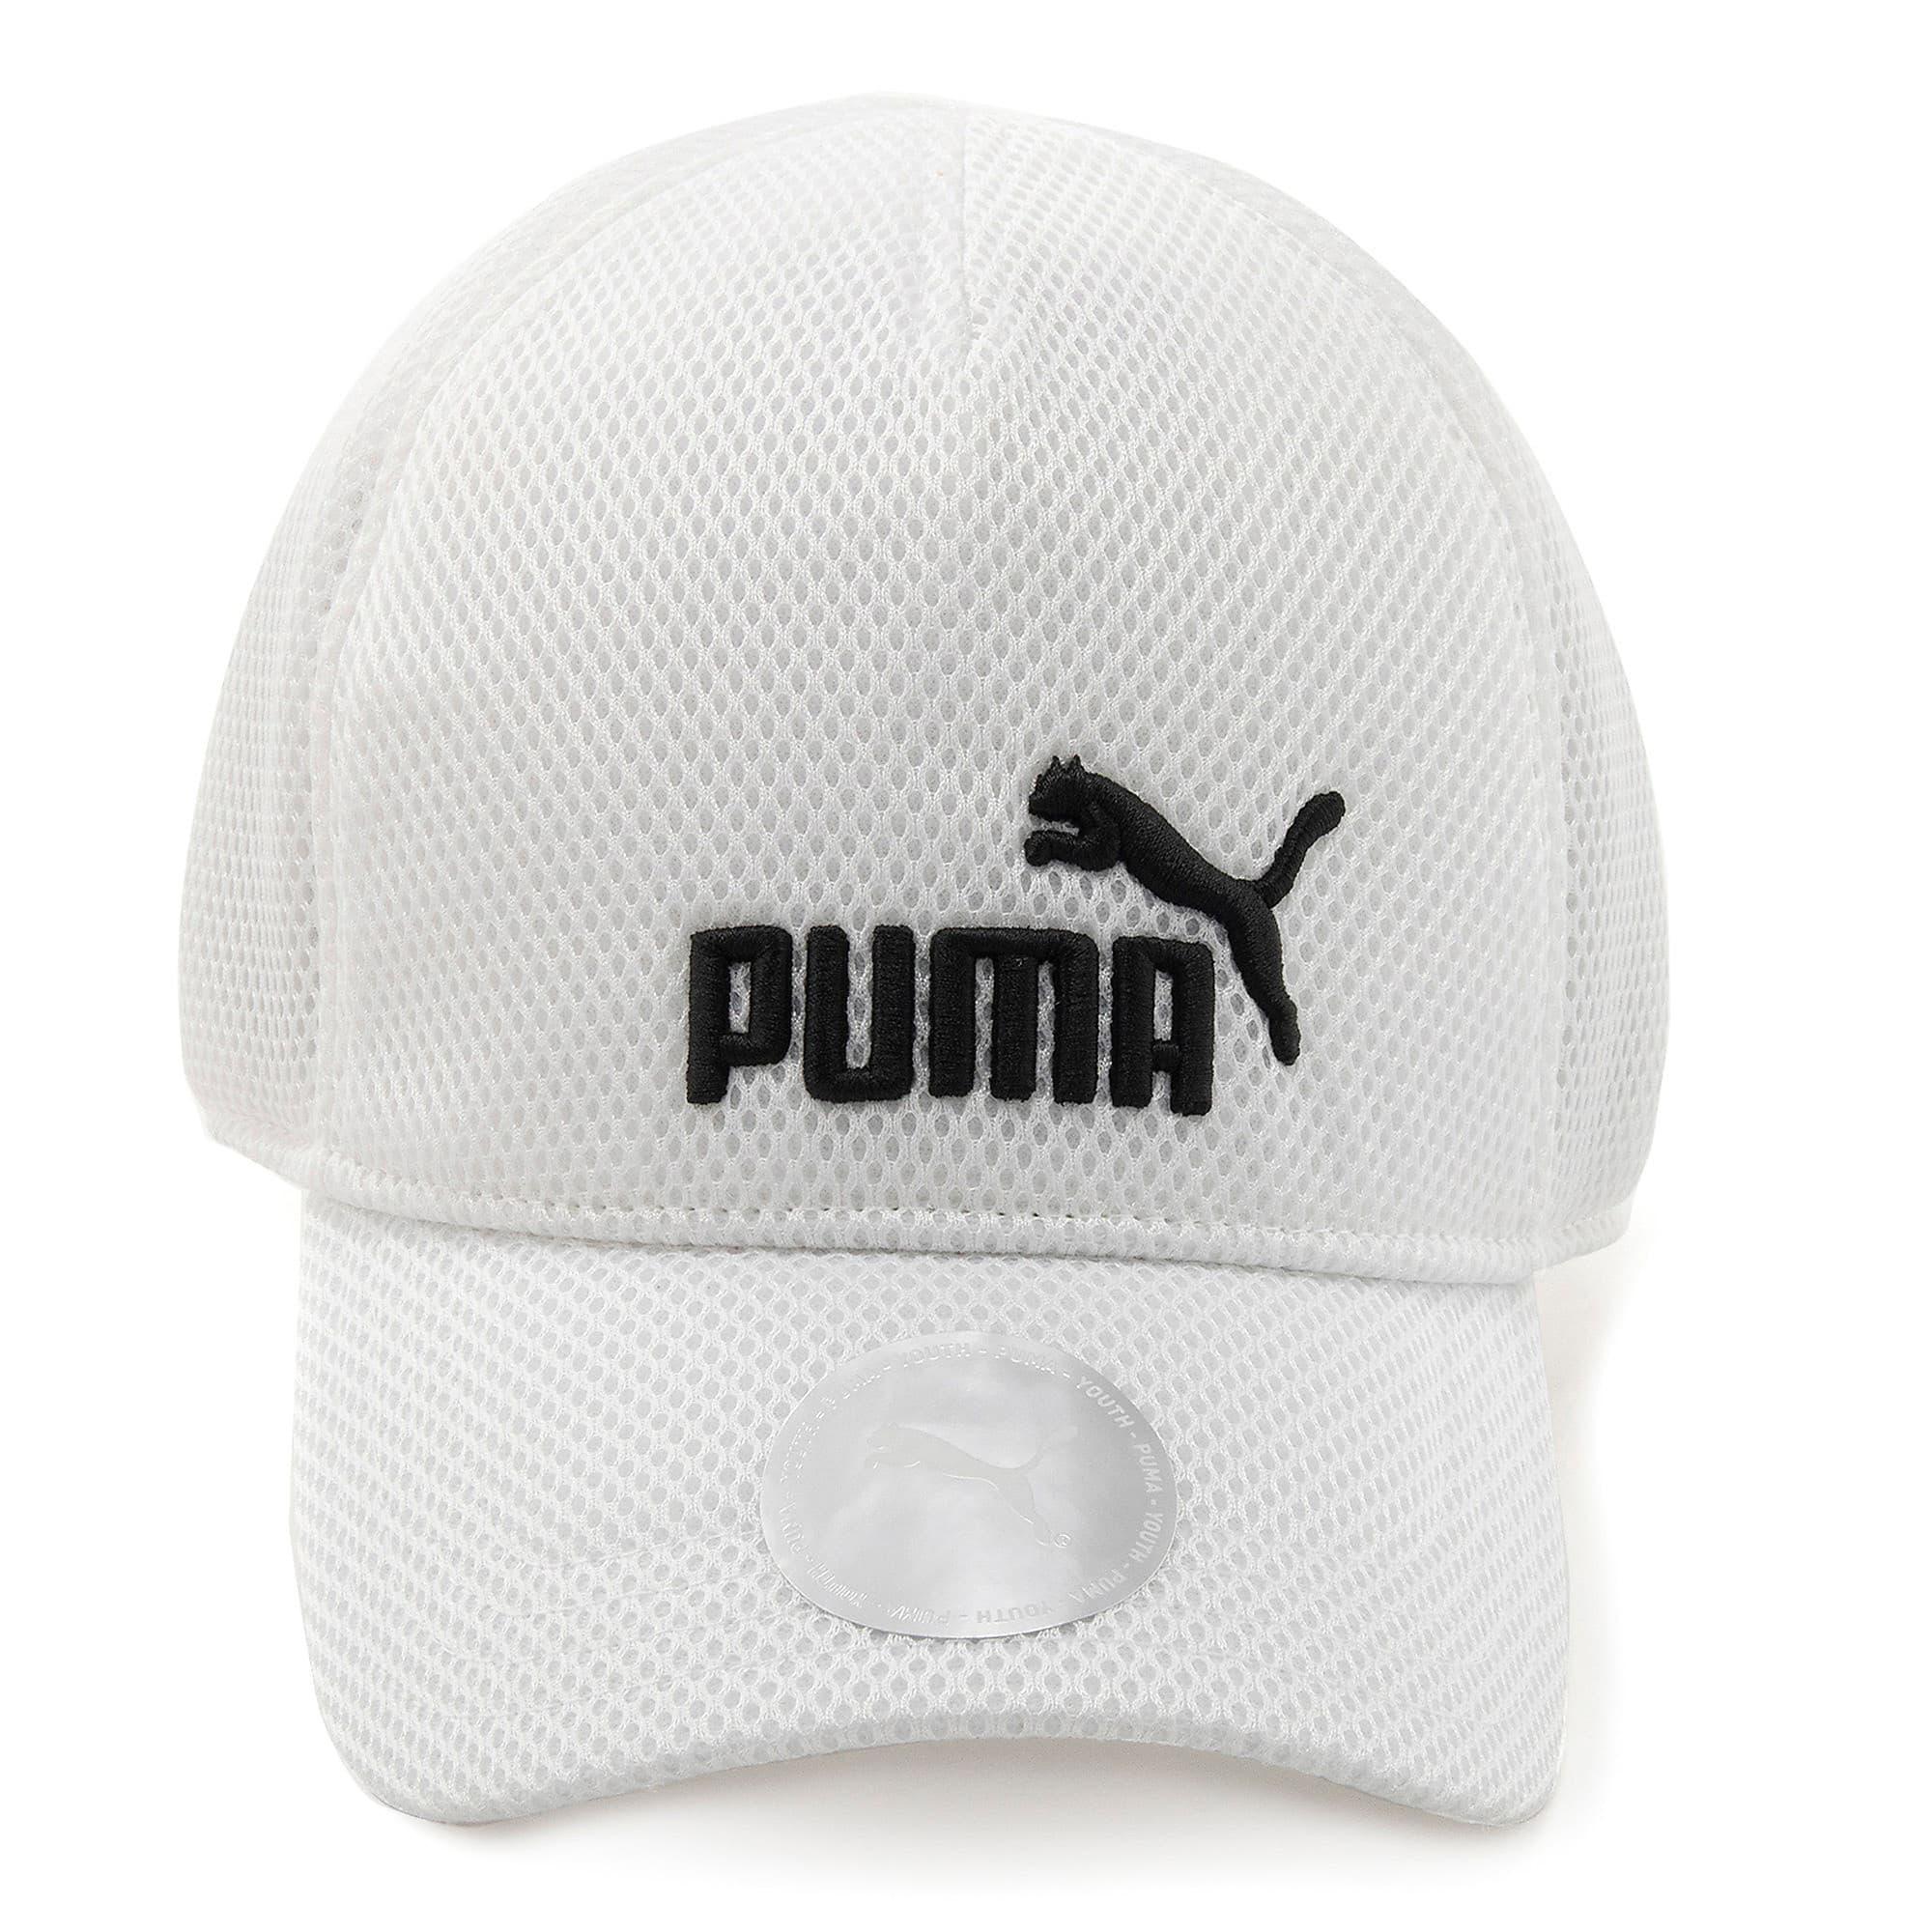 Thumbnail 4 of キッズ トレーニング メッシュ キャップ JR, Puma White-No 1, medium-JPN